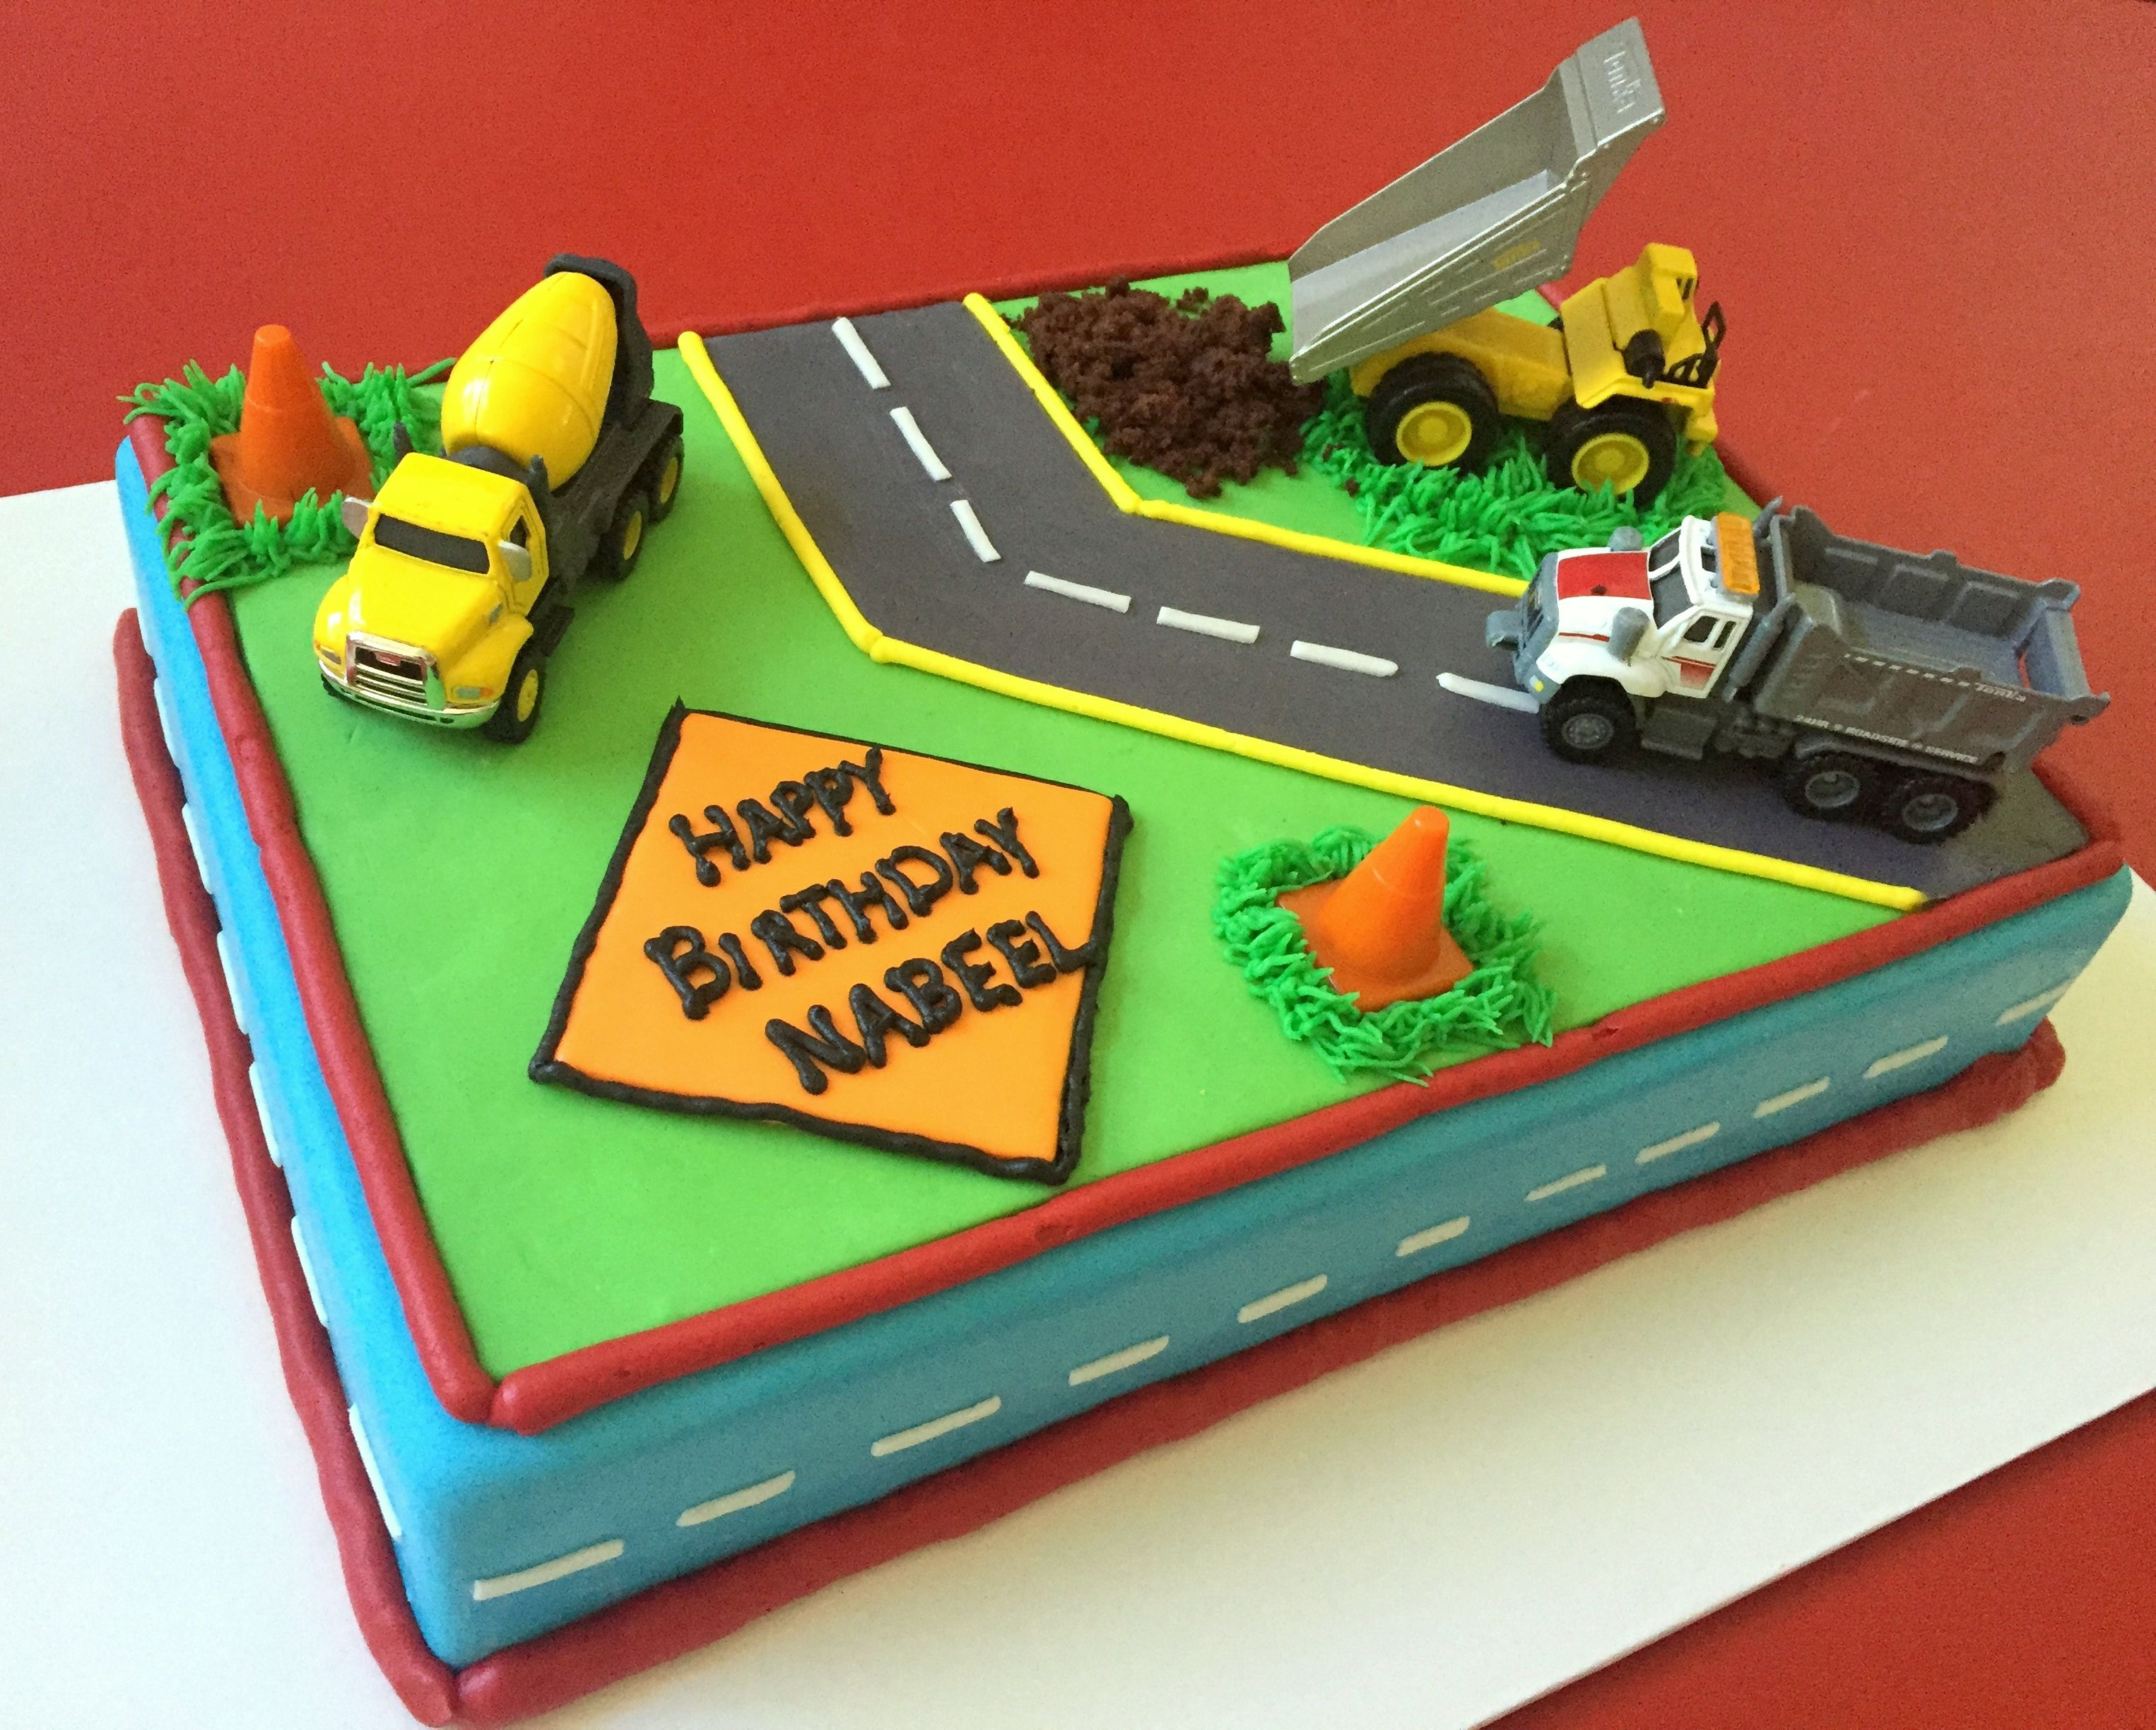 Strange Tonka Truck Cake With Images Tonka Truck Cake Dump Truck Funny Birthday Cards Online Necthendildamsfinfo